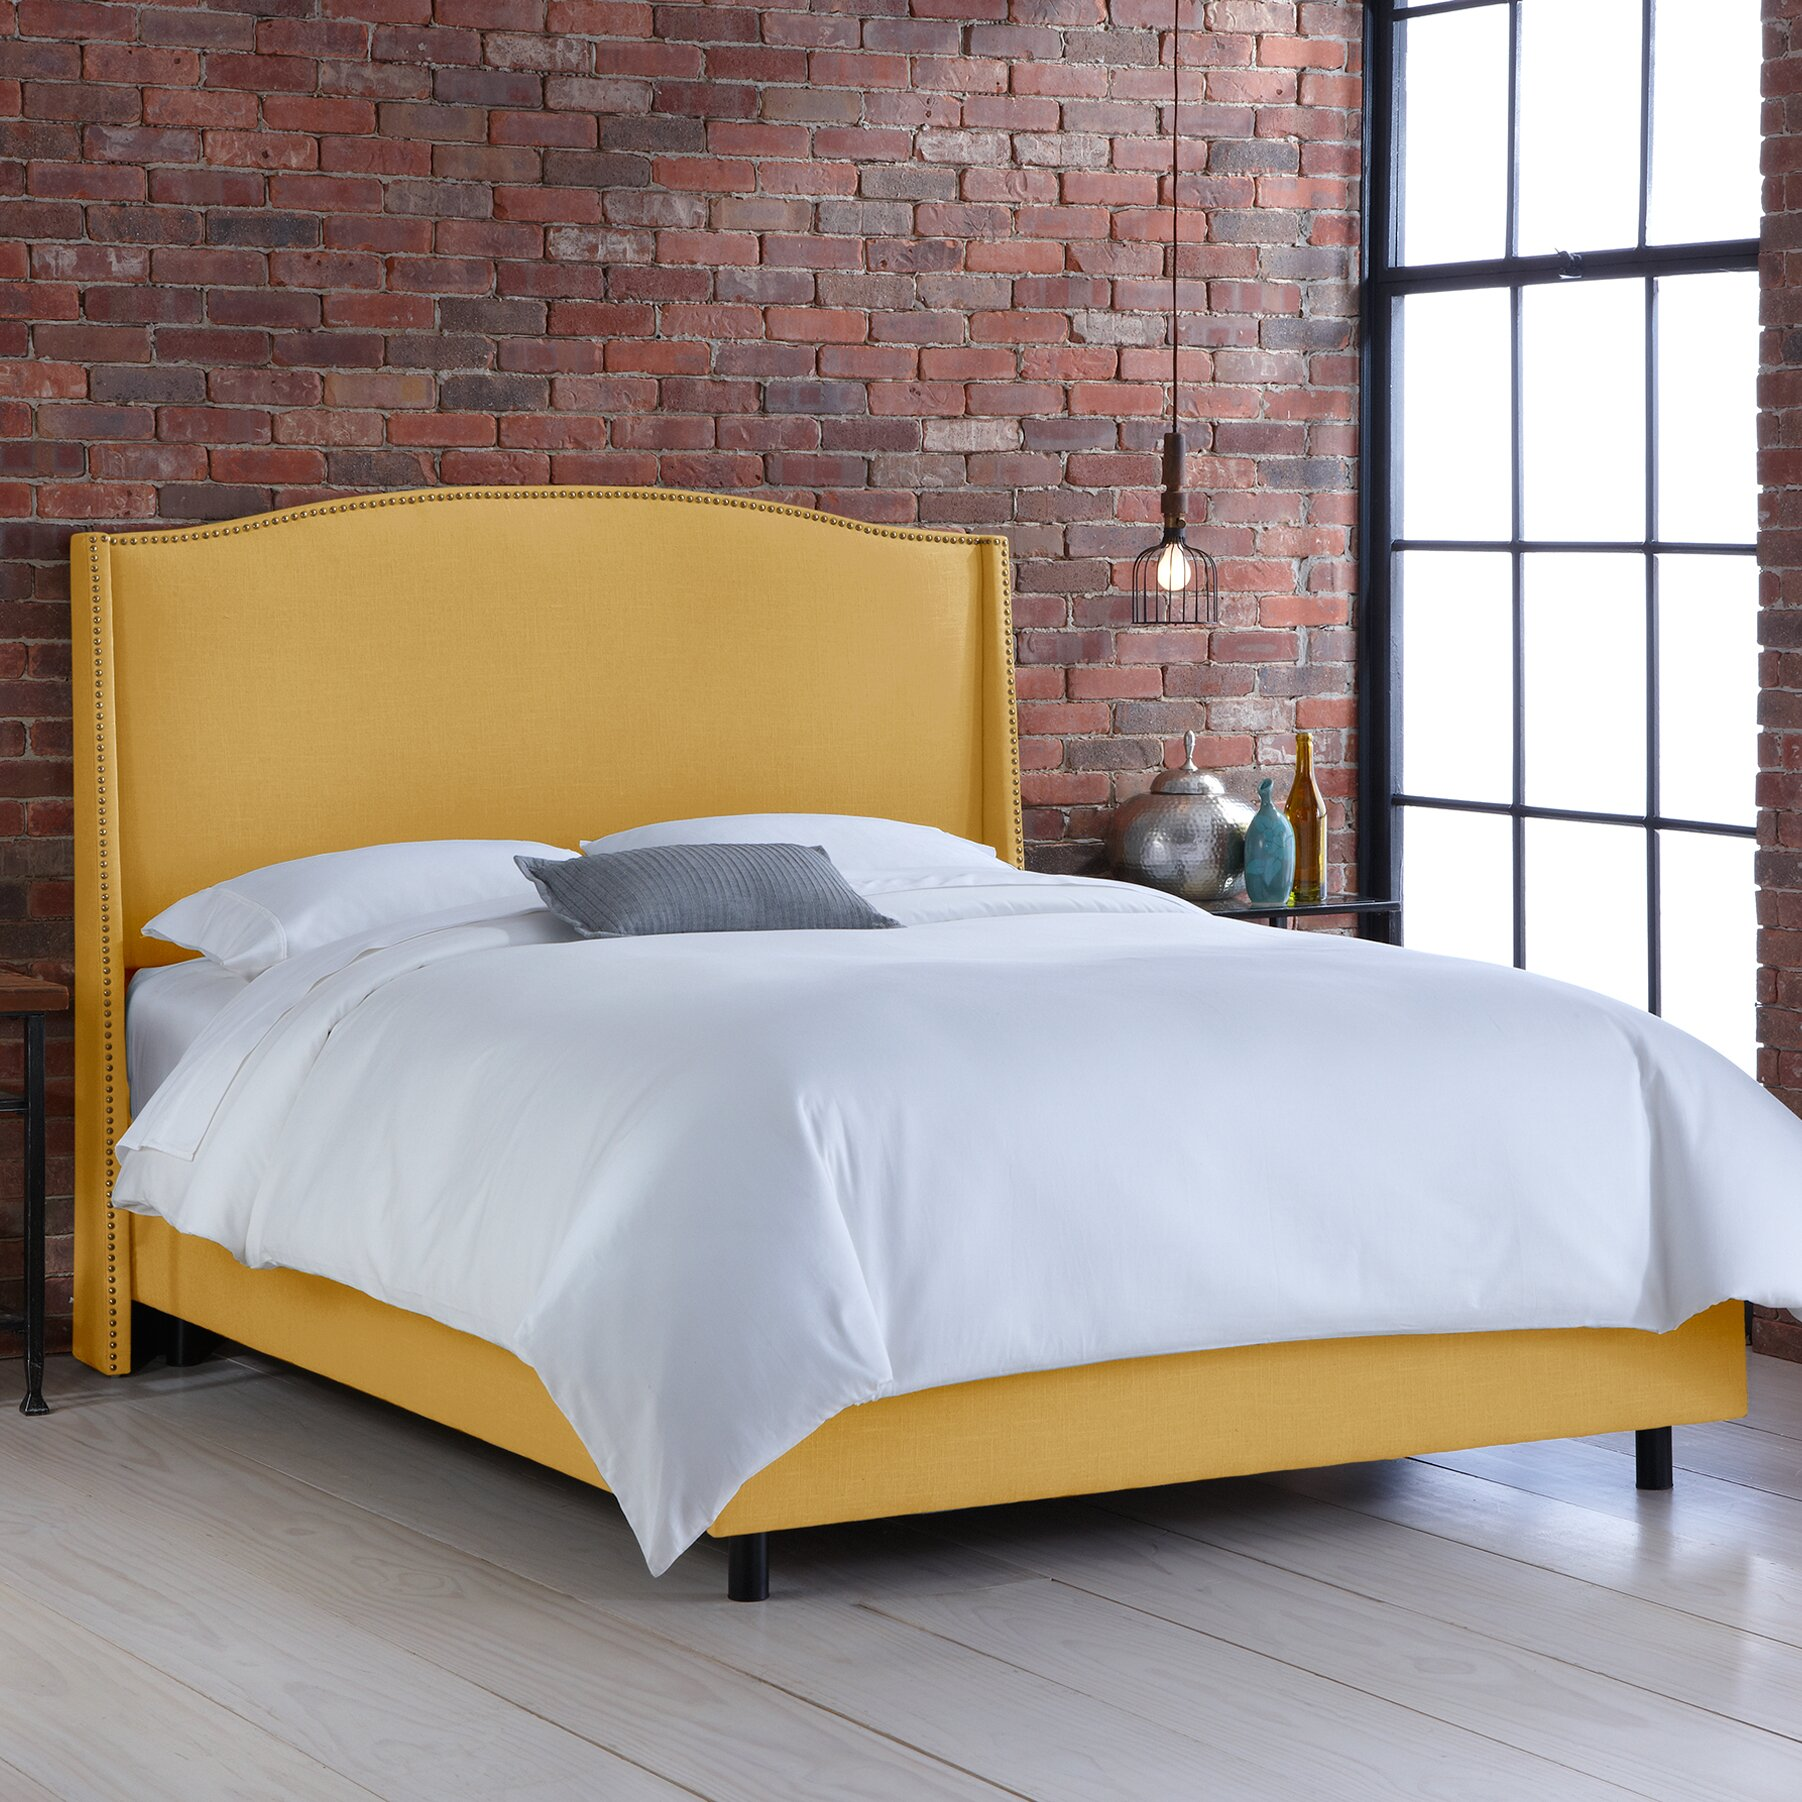 Wayfair All Modern: Skyline Furniture Nail Button Upholstered Panel Bed